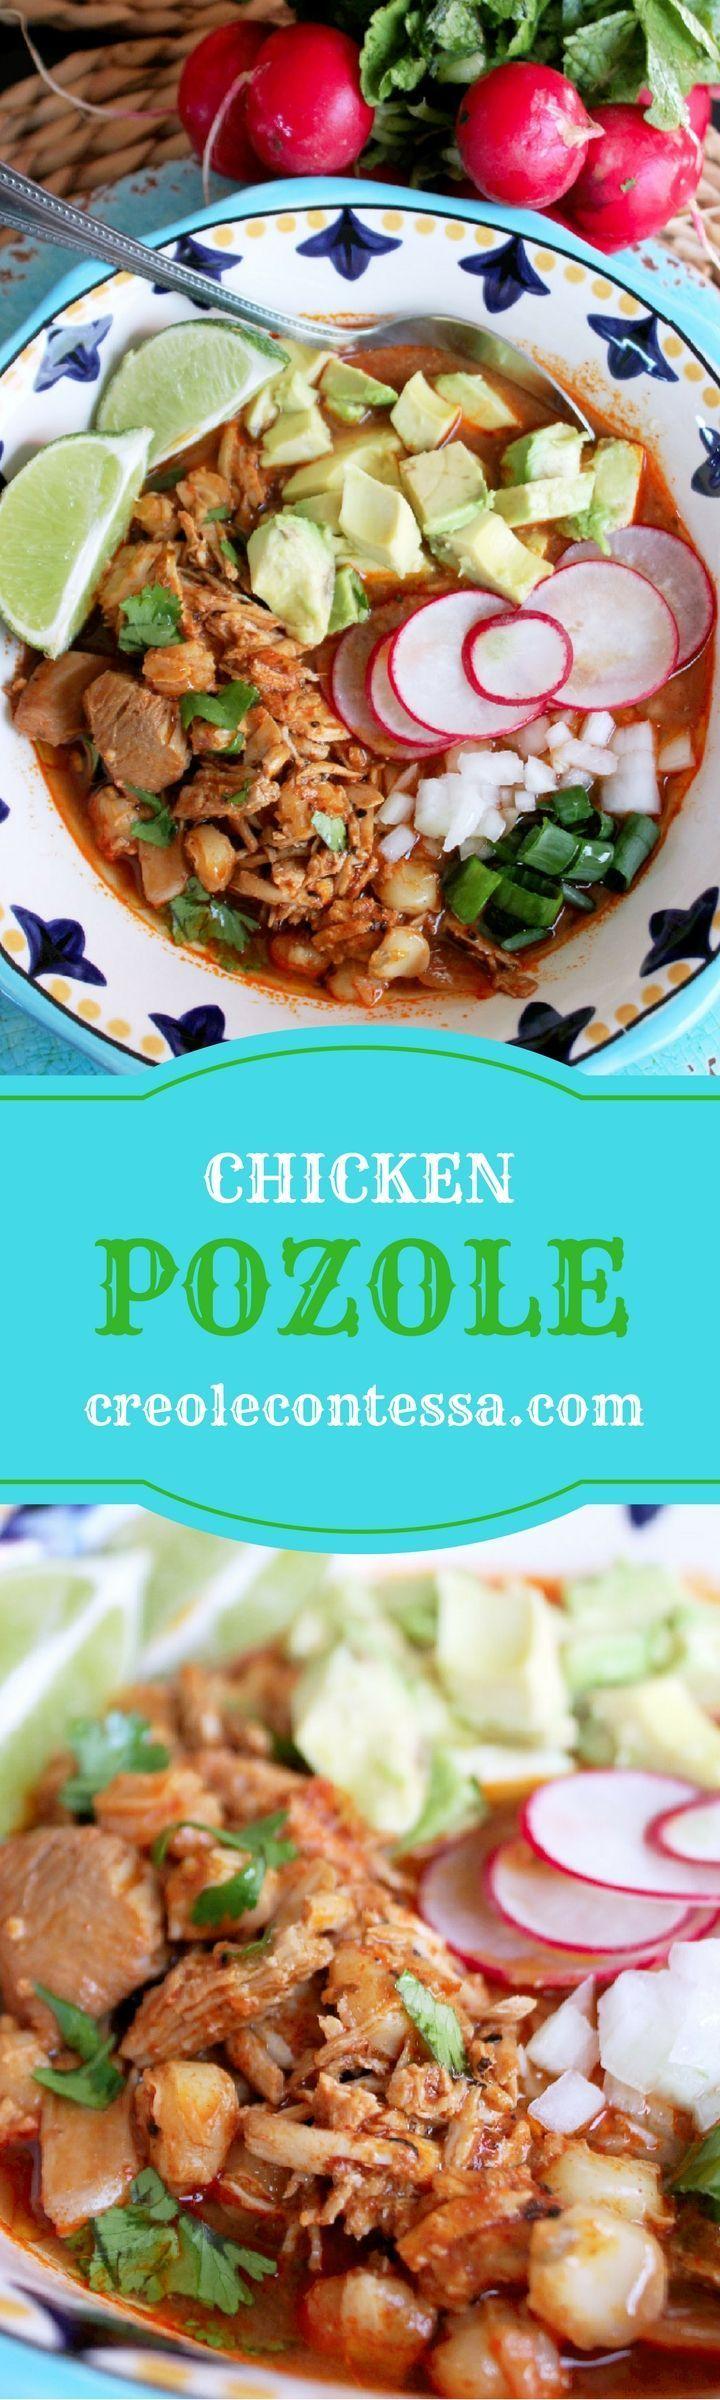 Slow Cooker Chicken Pozole-Creole Contessa